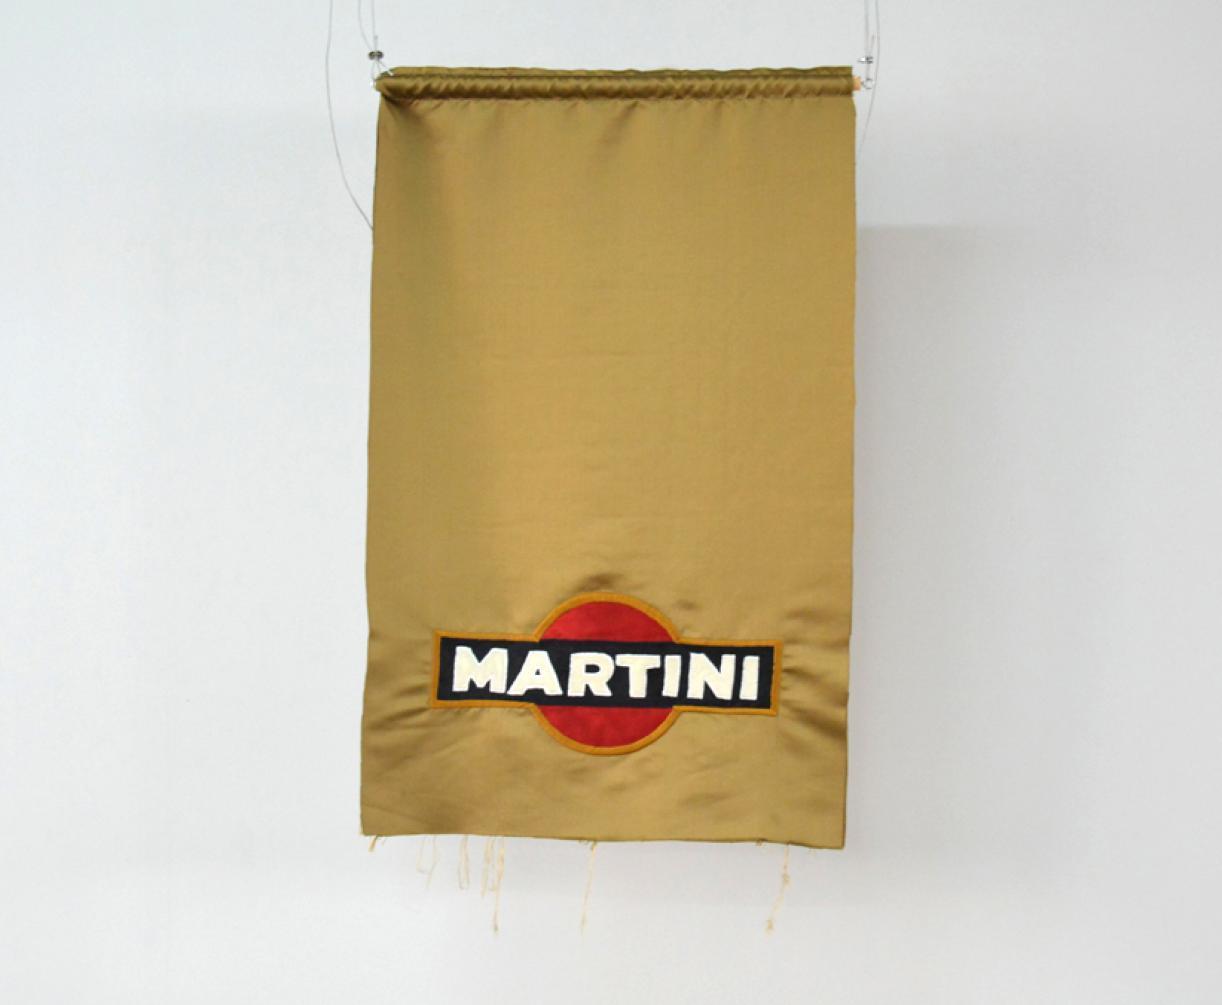 Blazon: Parc, Martini Logo, 2015, Embroidery and applique on textile, 98 x 62 cm, Ed. 3 + 2 AP